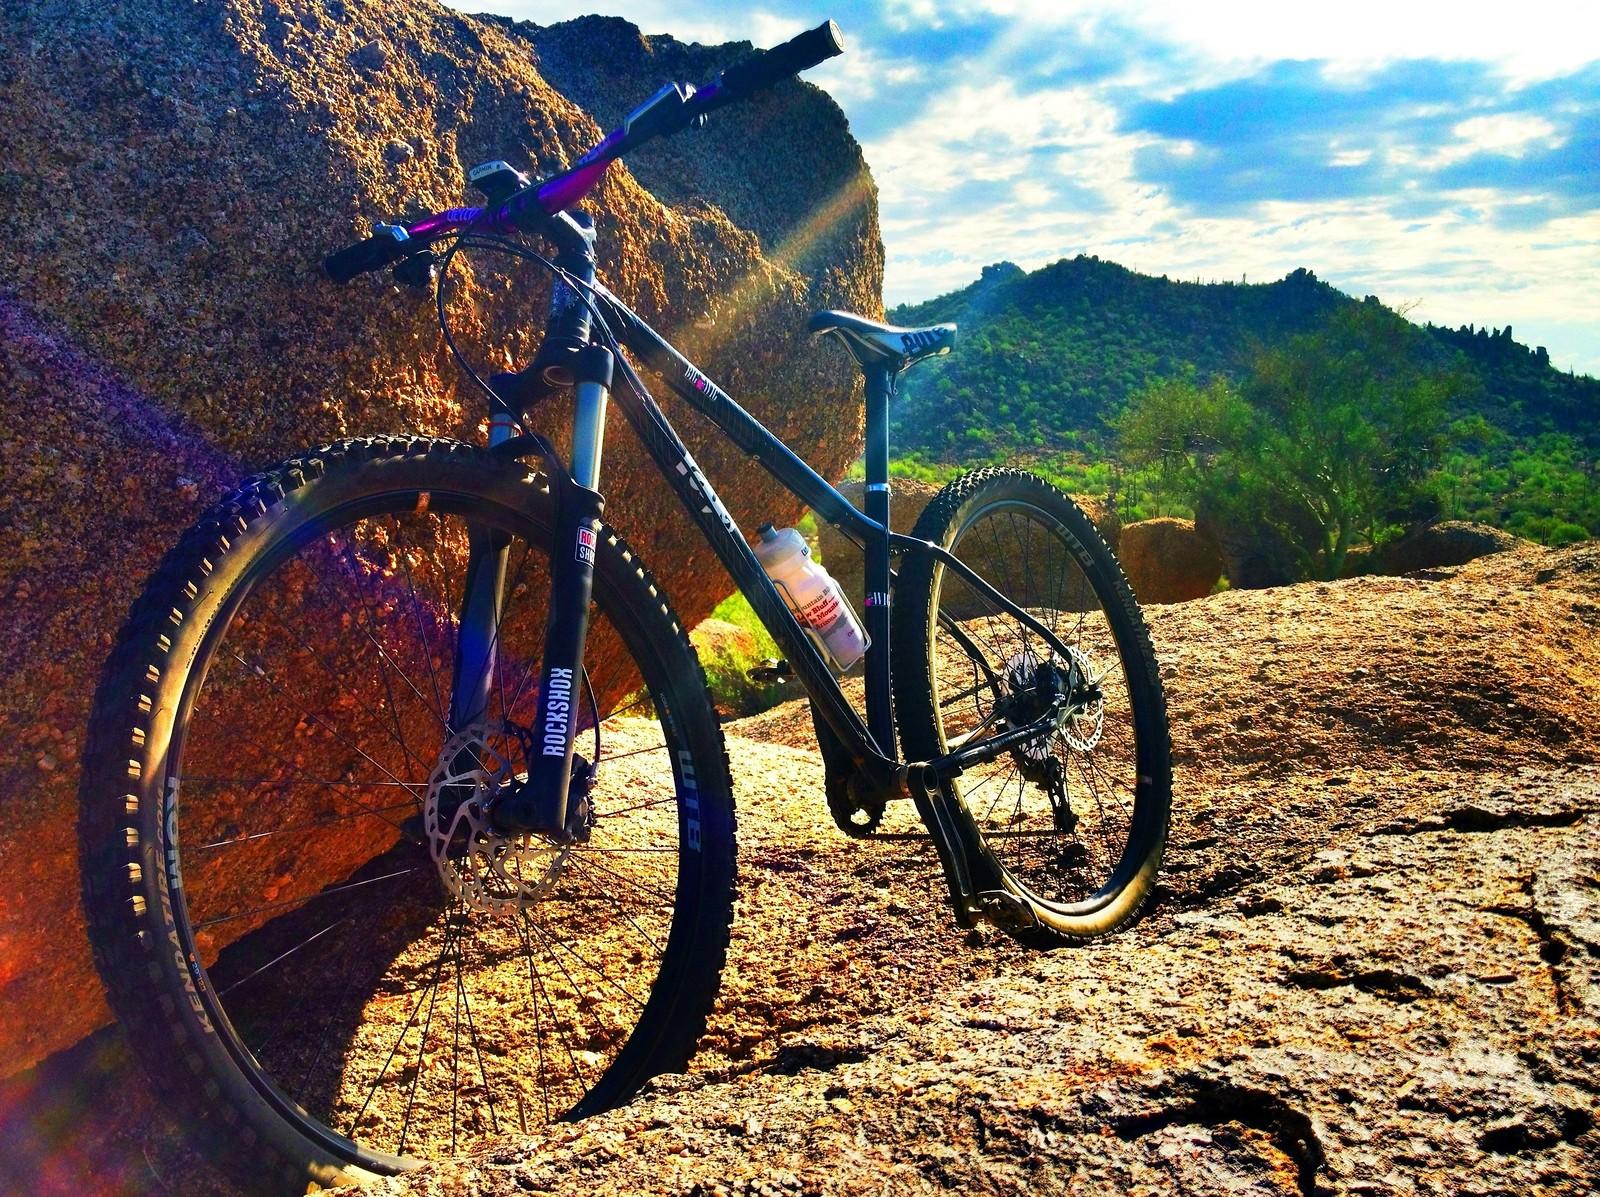 Ragley BigPig - azmtbr - Mountain Biking Pictures - Vital MTB